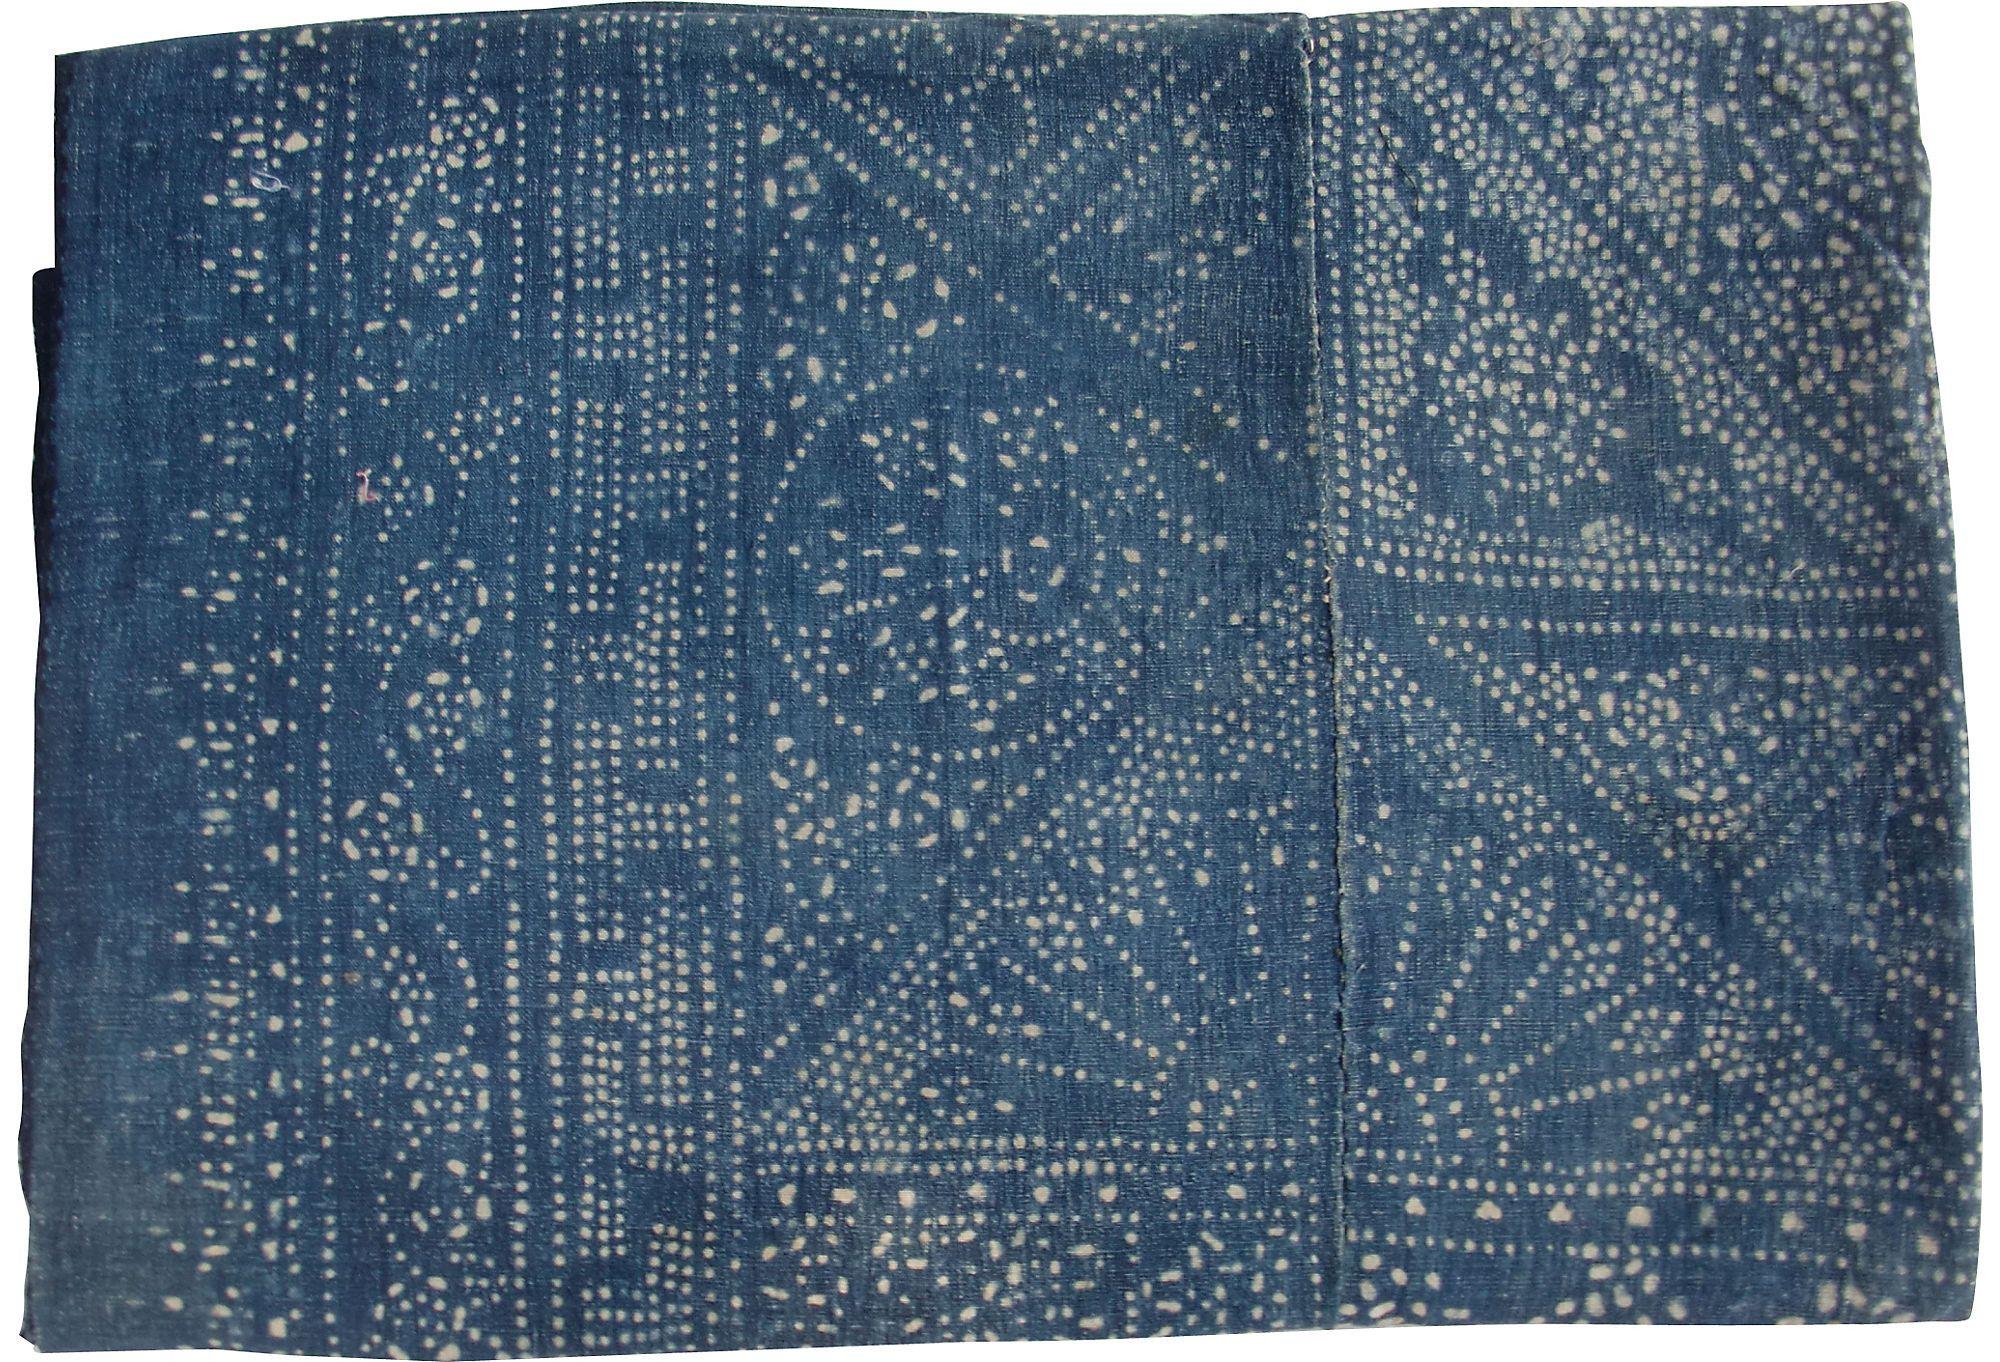 Blue & White Batik Panel